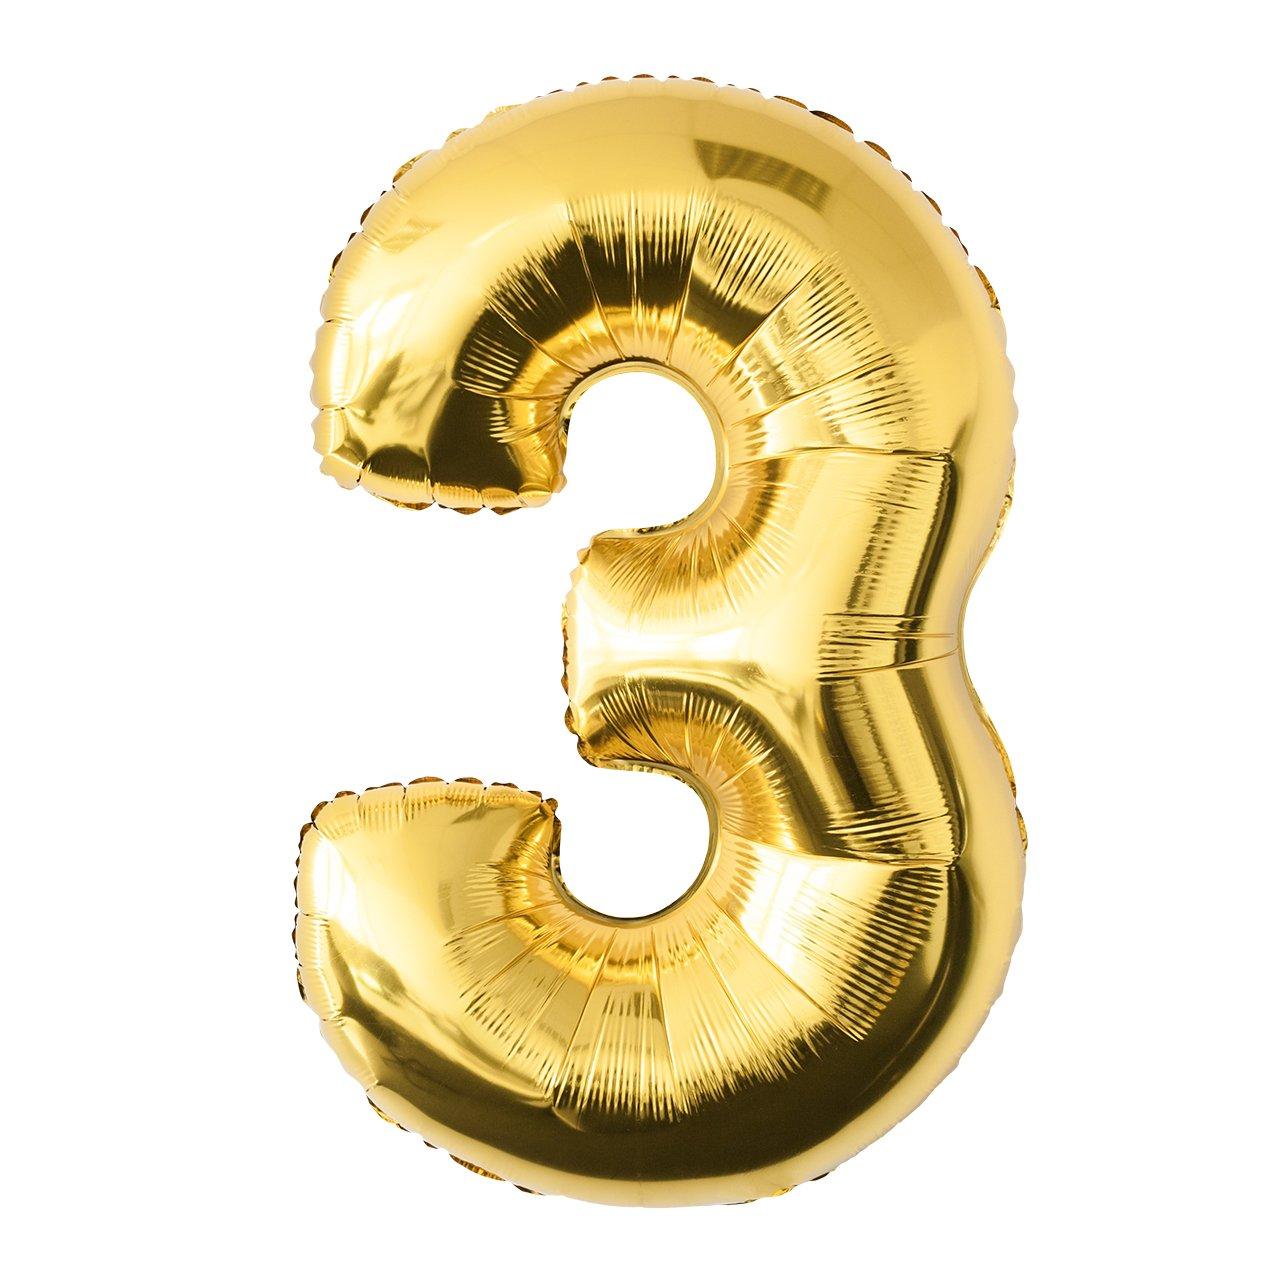 Globo de lámina 3 dorado Número enorme 100 cm rellenable con helio o aero fiesta de cumpleaños